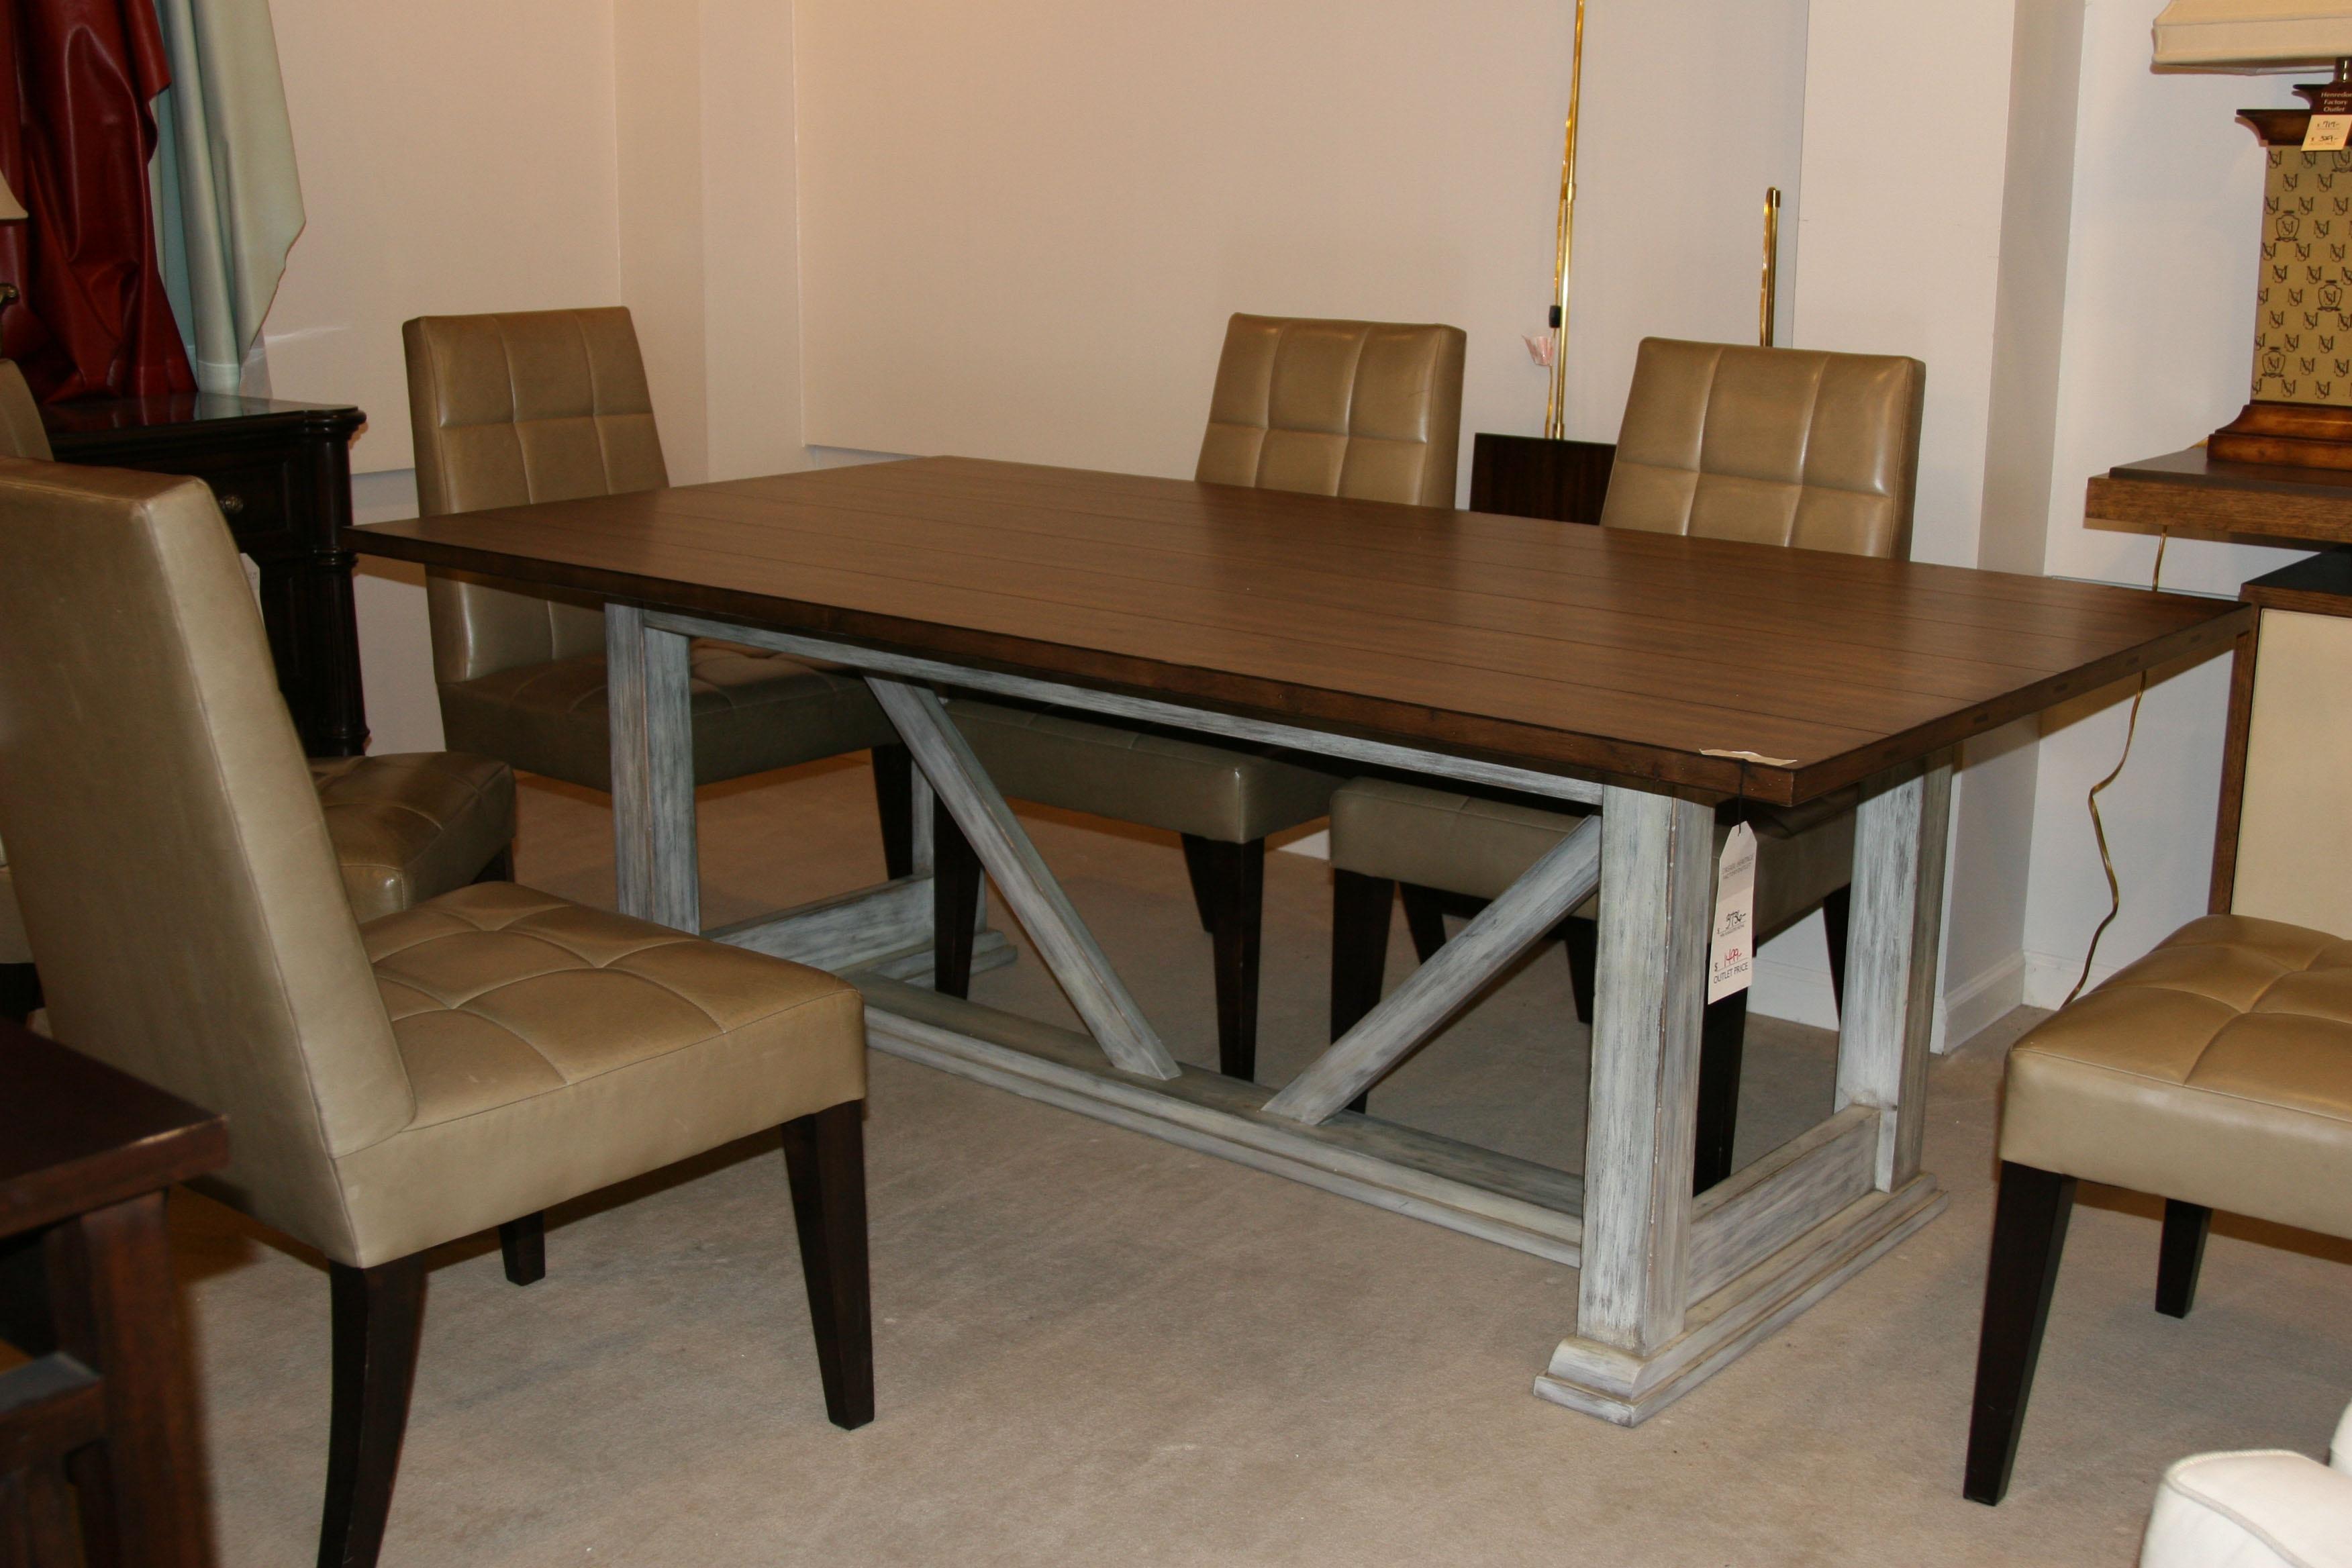 arlington round sienna pedestal dining room table w chestnut finish. 325-660std. trestle dining table arlington round sienna pedestal room w chestnut finish